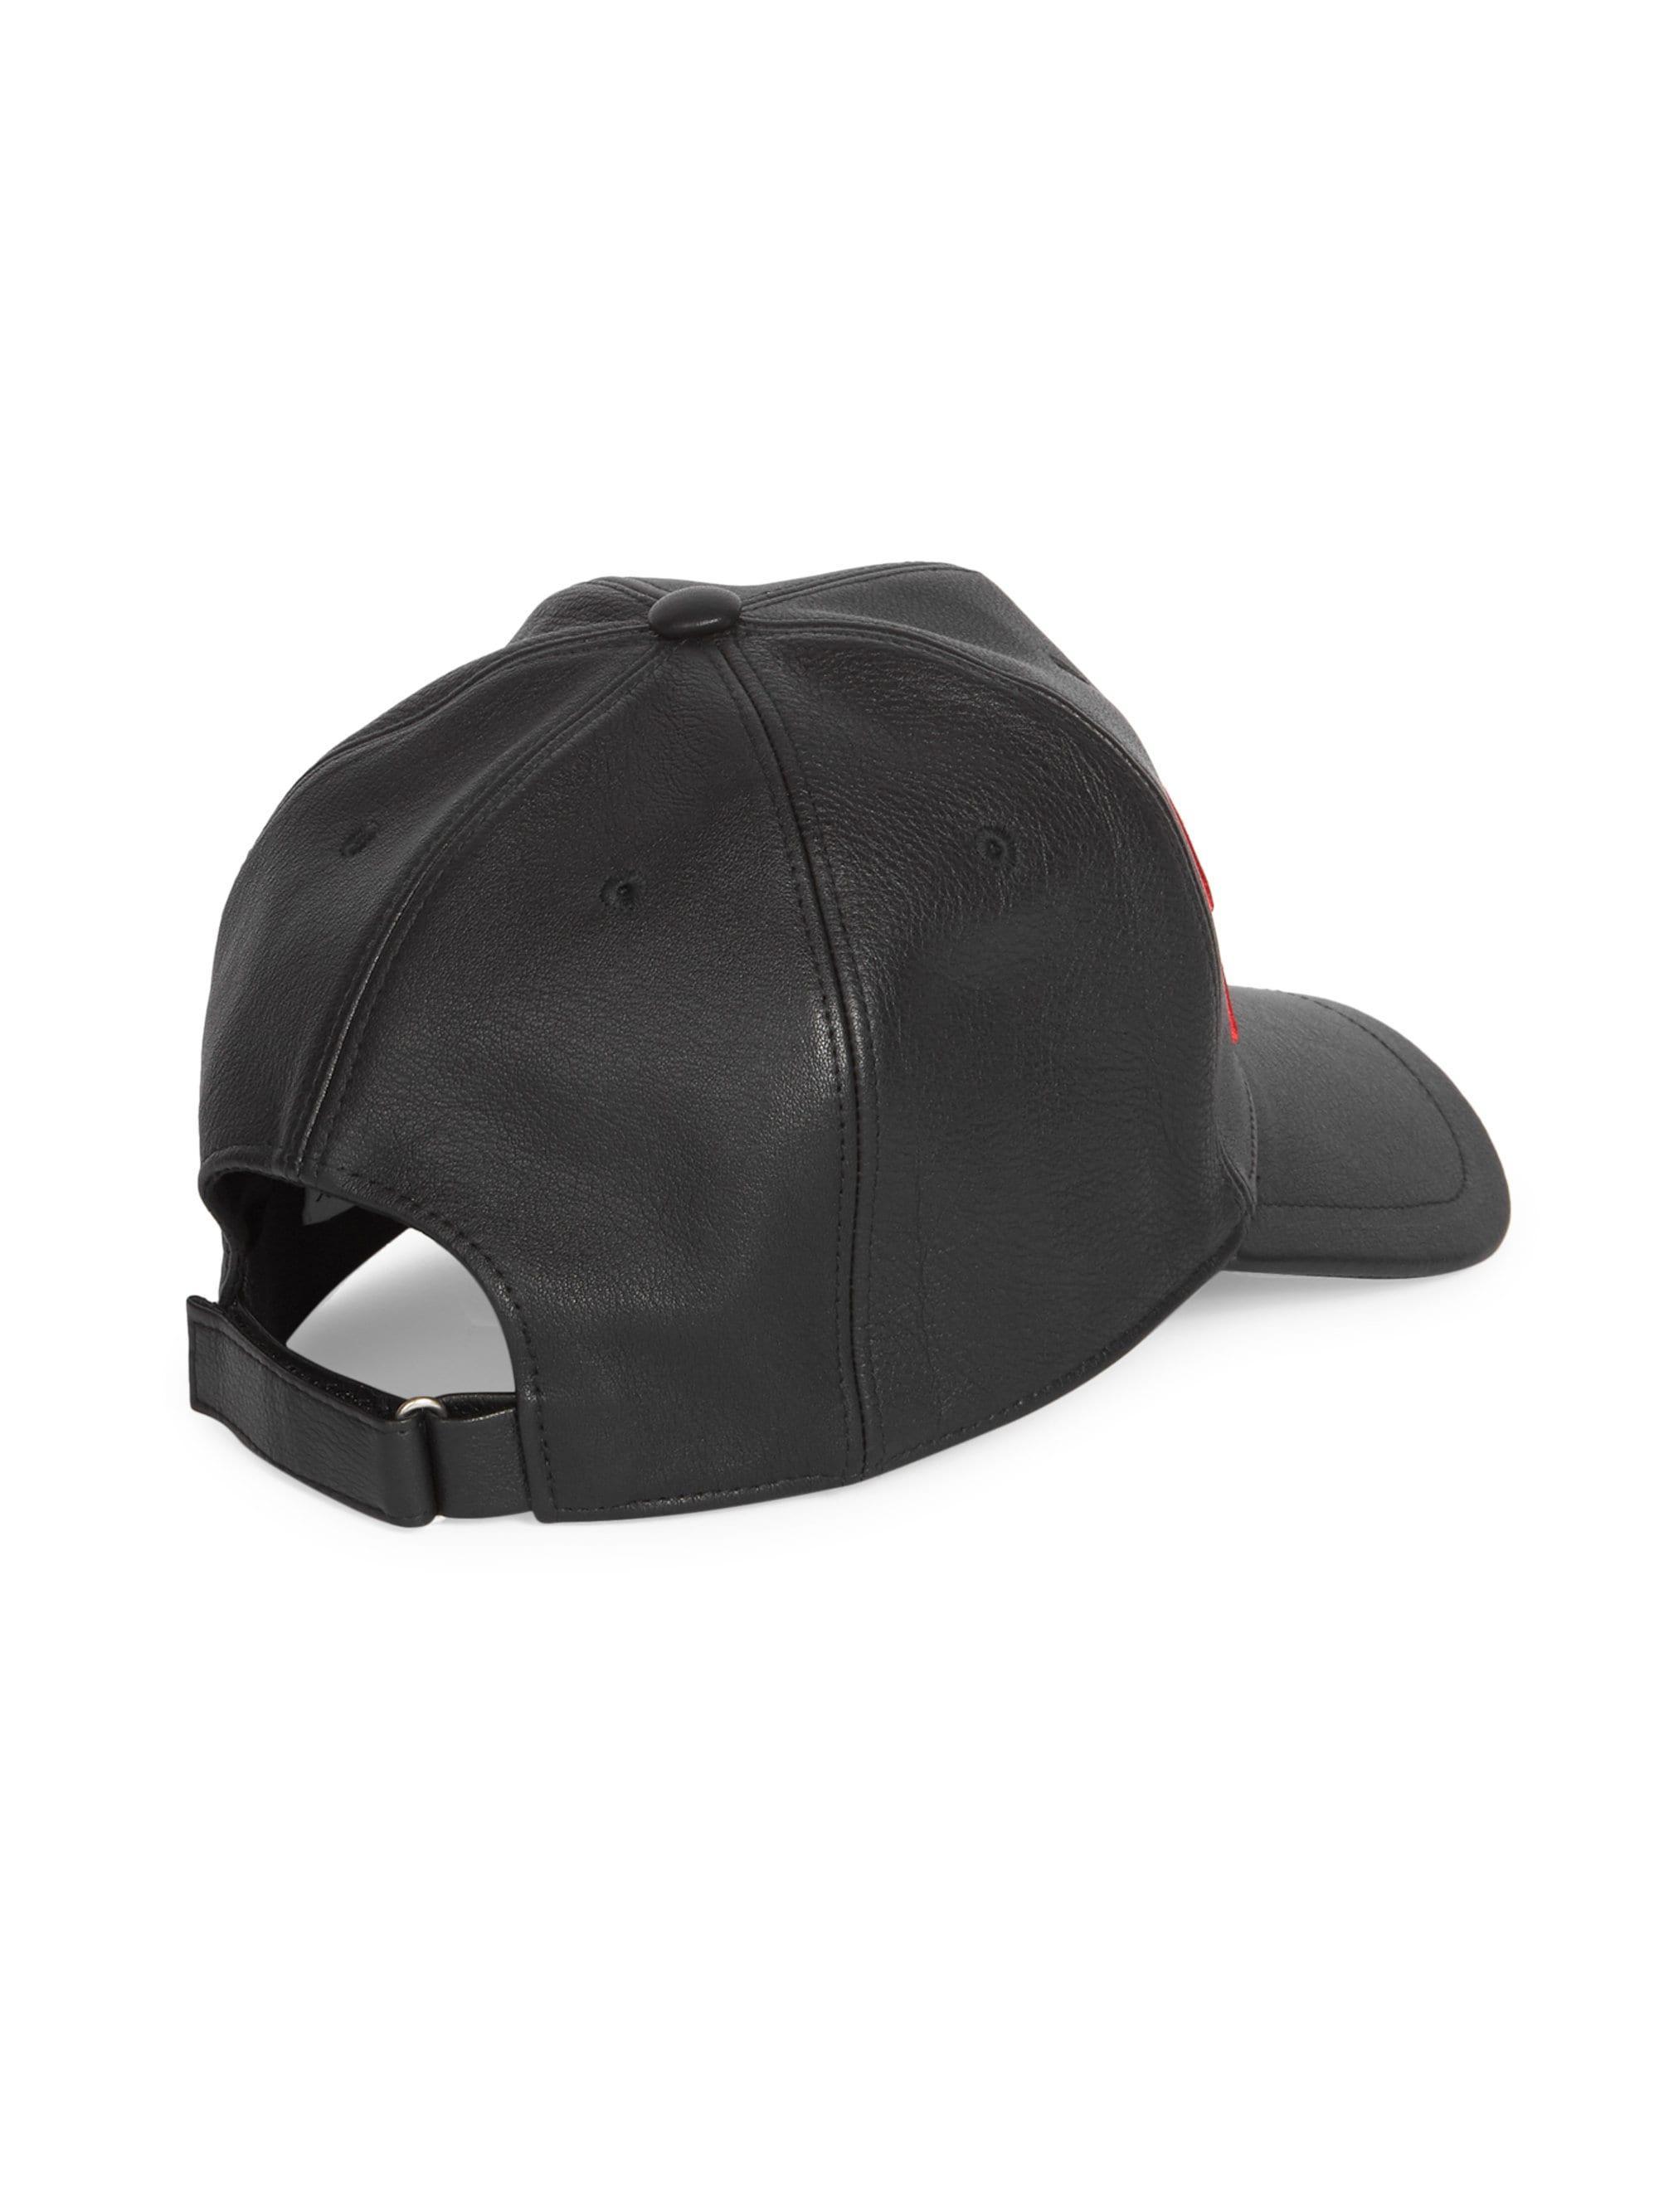 f86b301153e Givenchy - Men s Signature Logo Leather Cap - Black Red for Men - Lyst.  View fullscreen